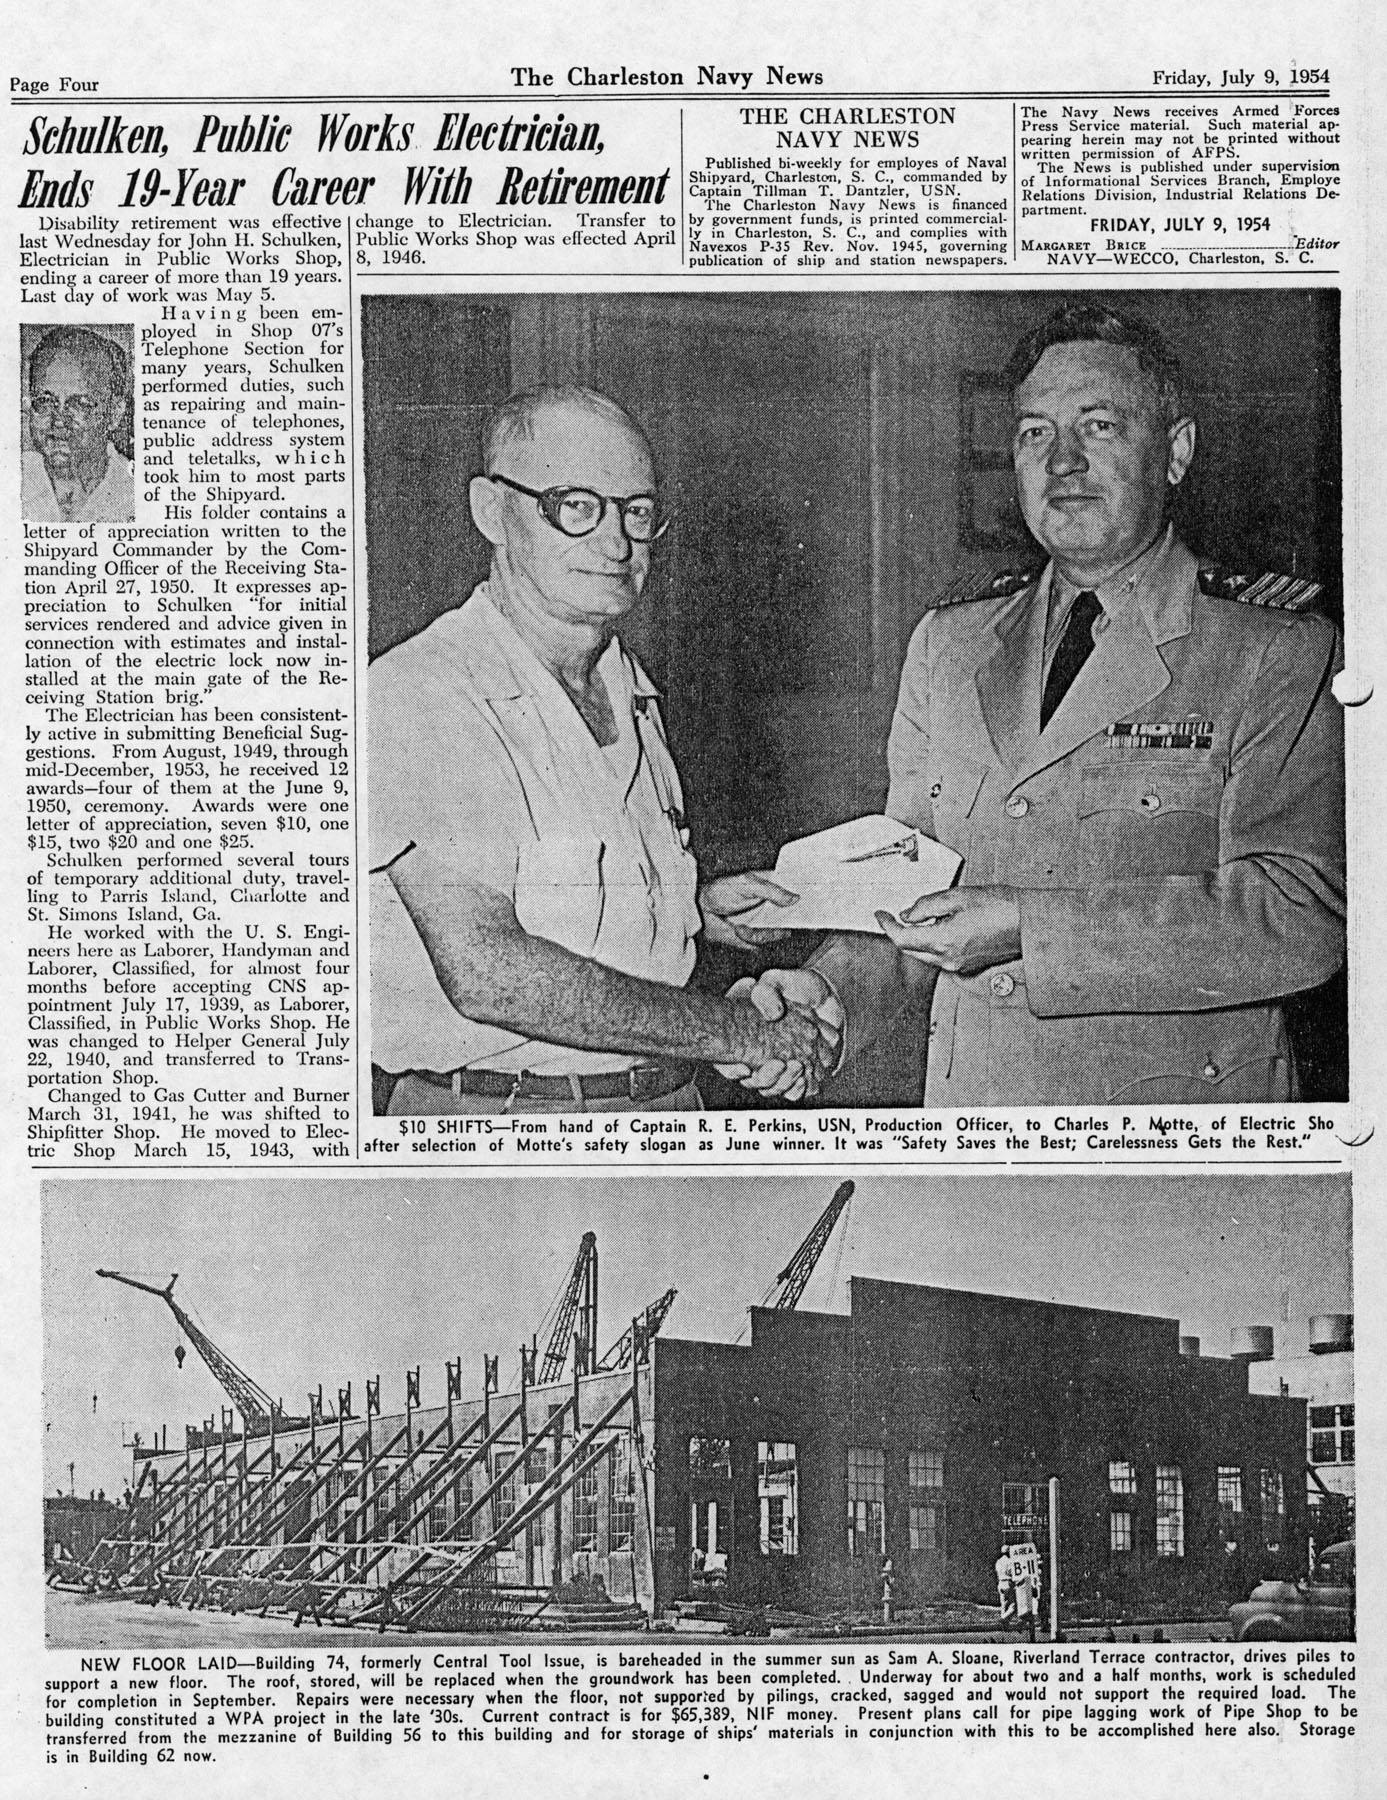 The Charleston Navy News, Volume 13, Edition 1, page iv